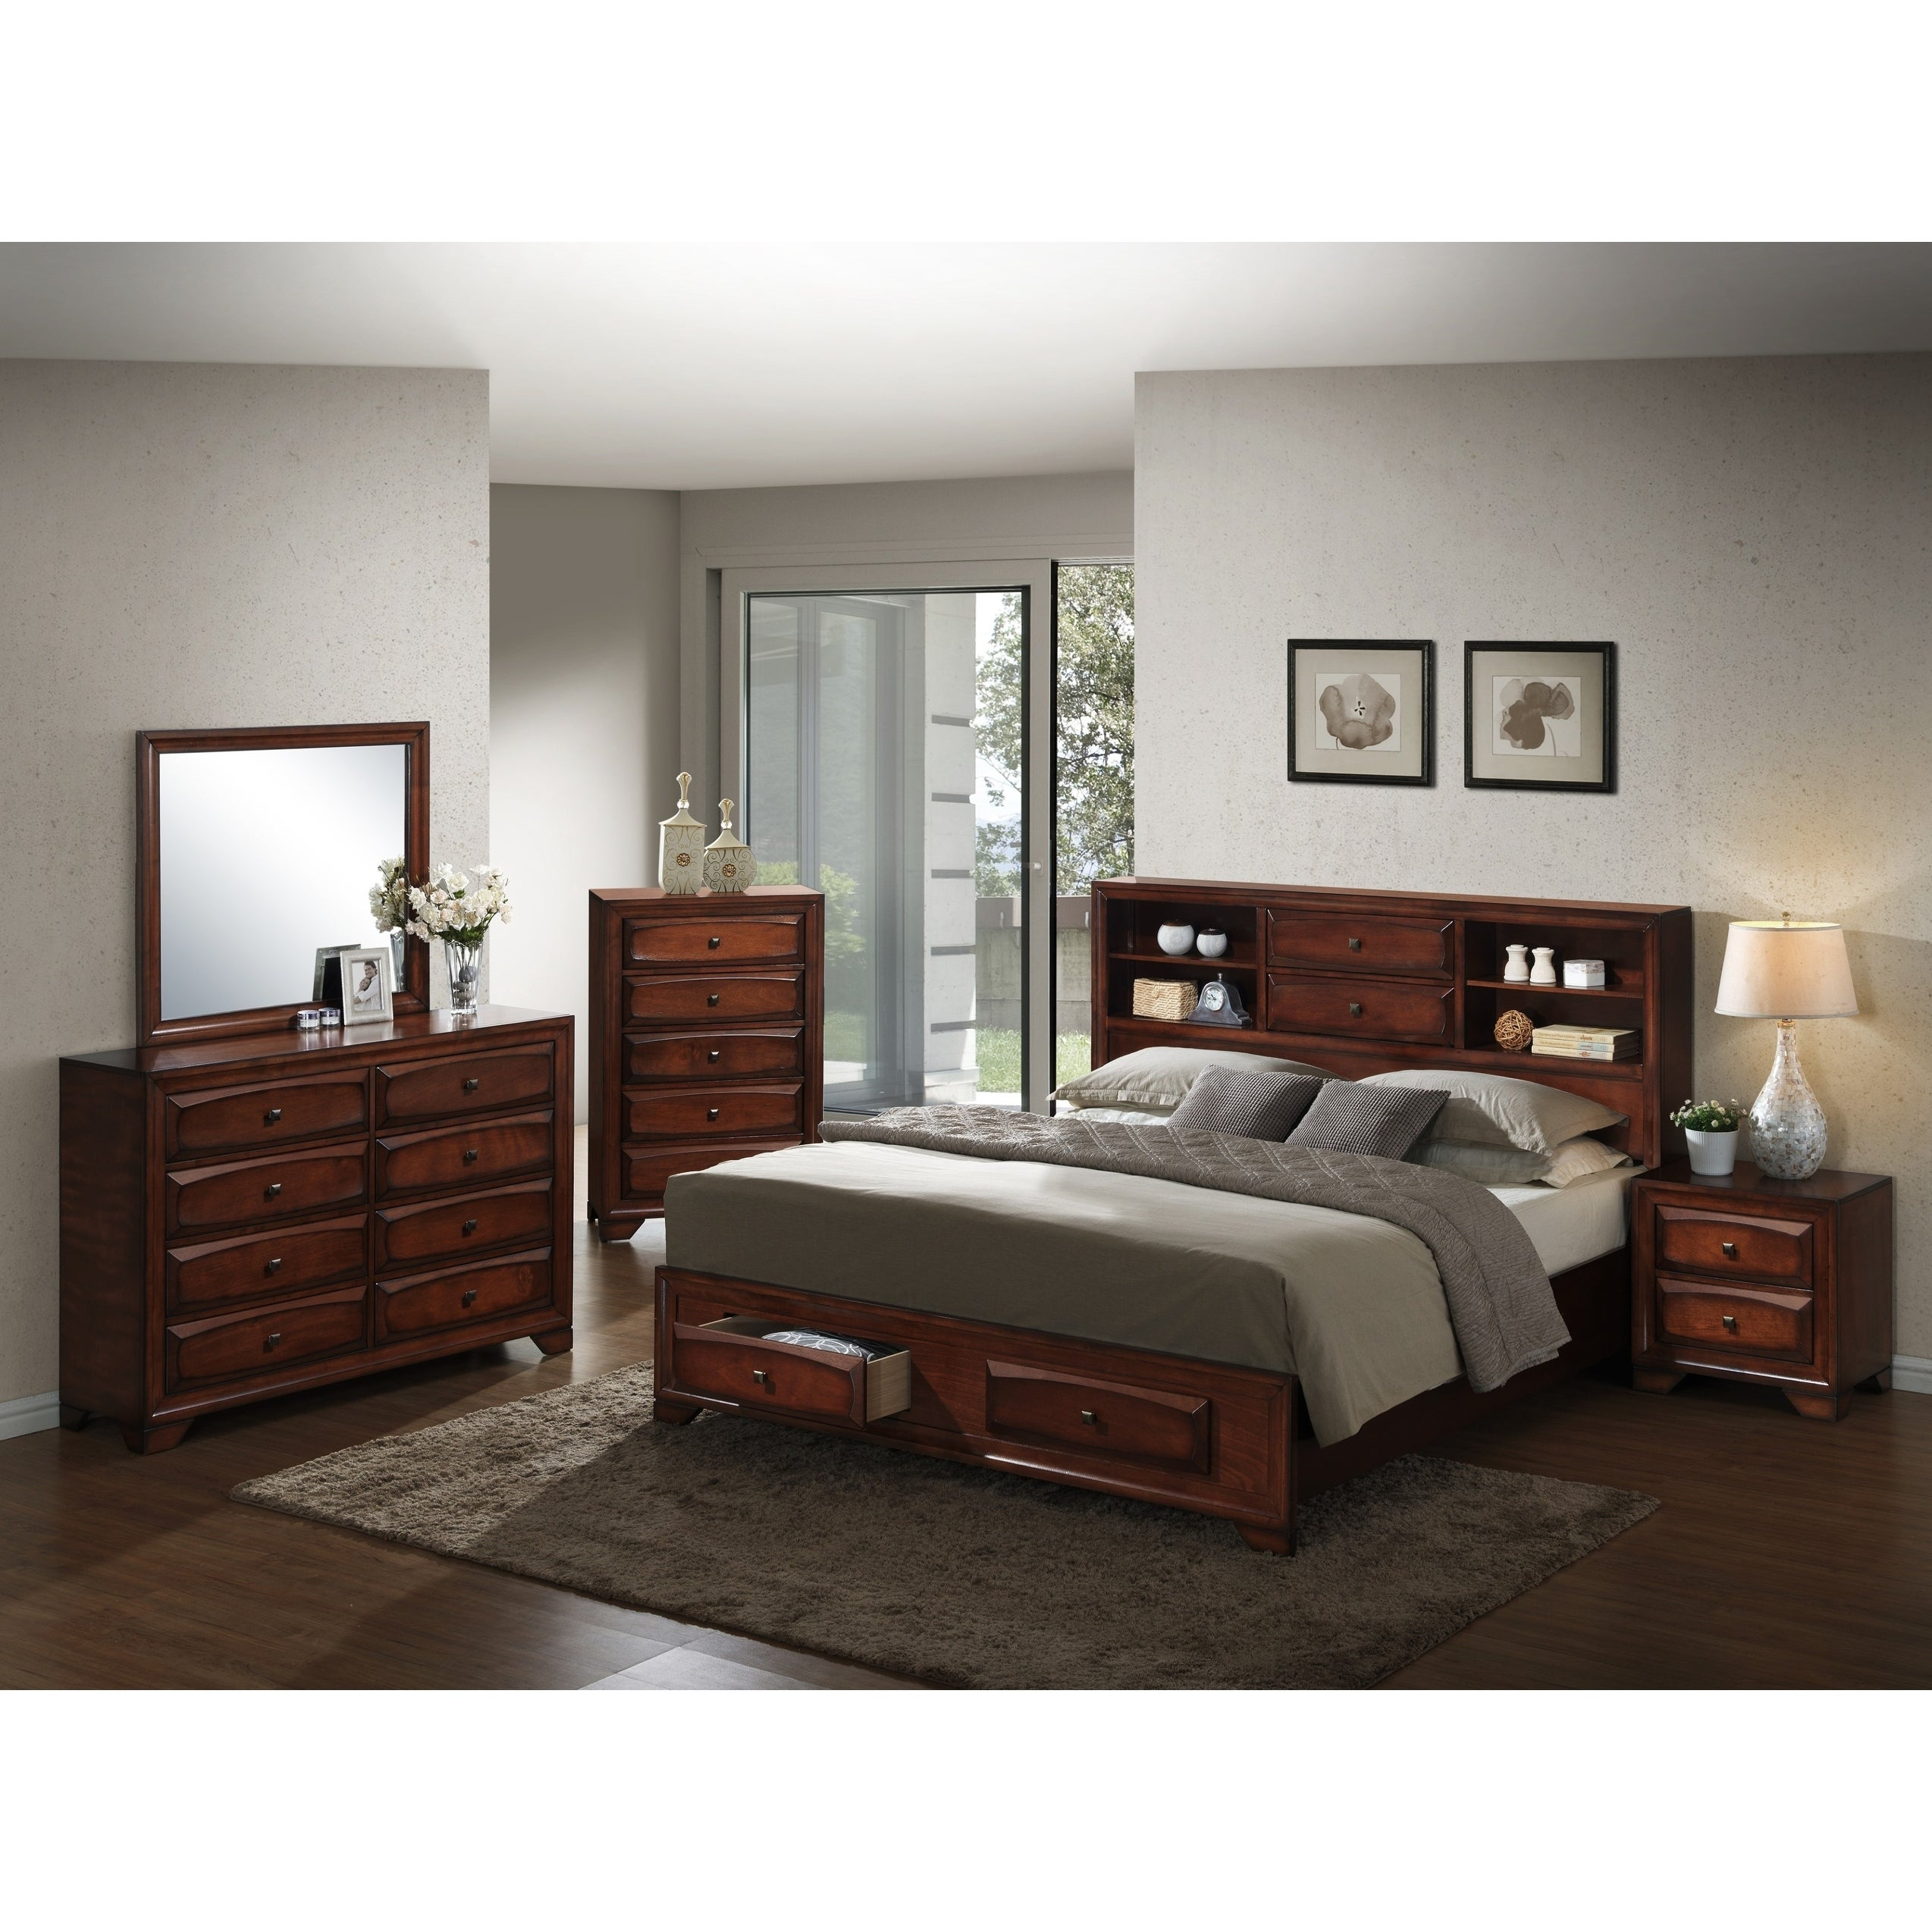 Shop Asger Antique Oak Finish Wood Queen Size 5 Piece Bedroom Set